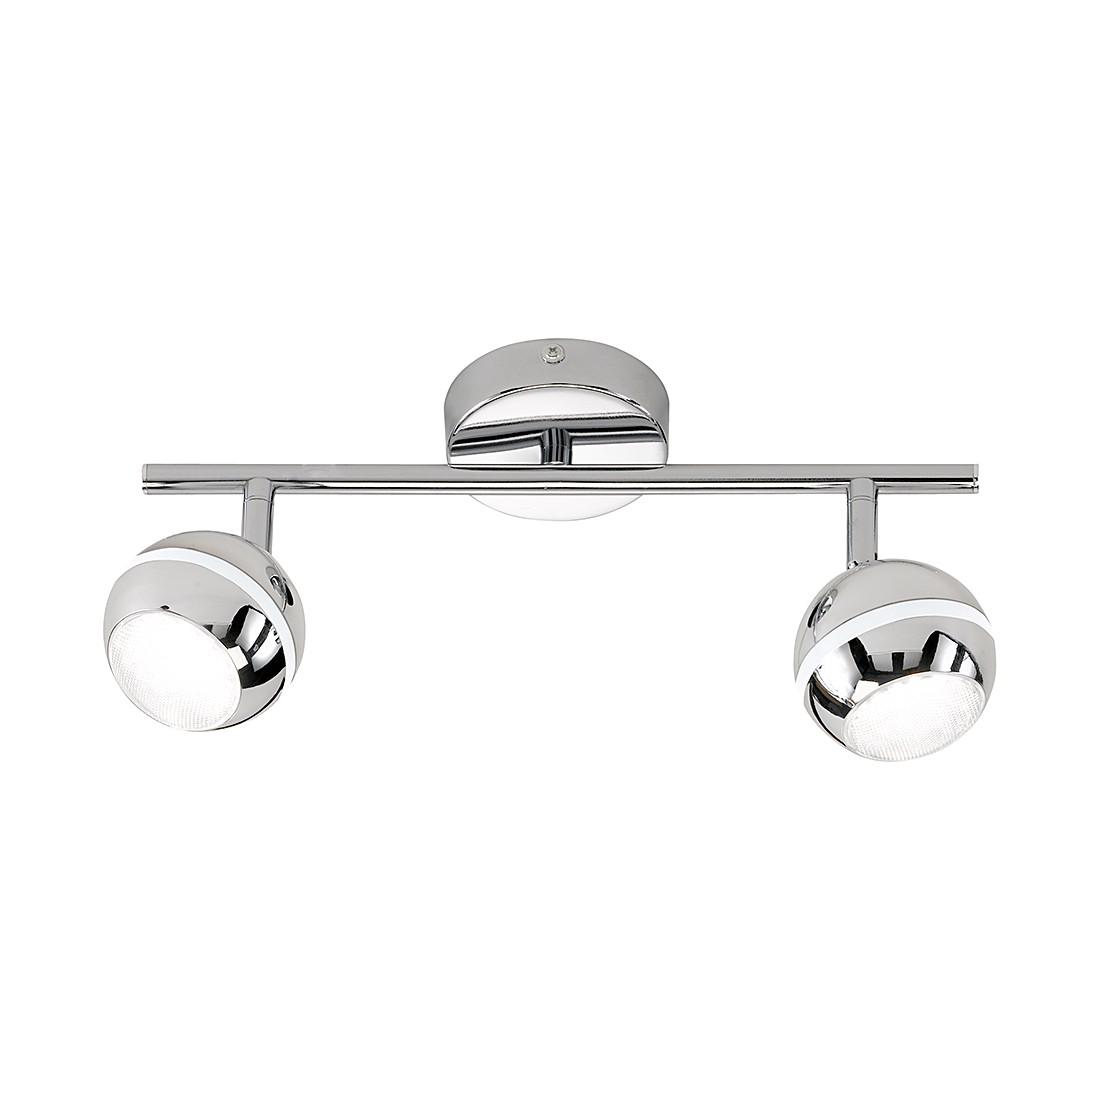 LED-Balken – Chrom – 2×4,2 W, Trio kaufen